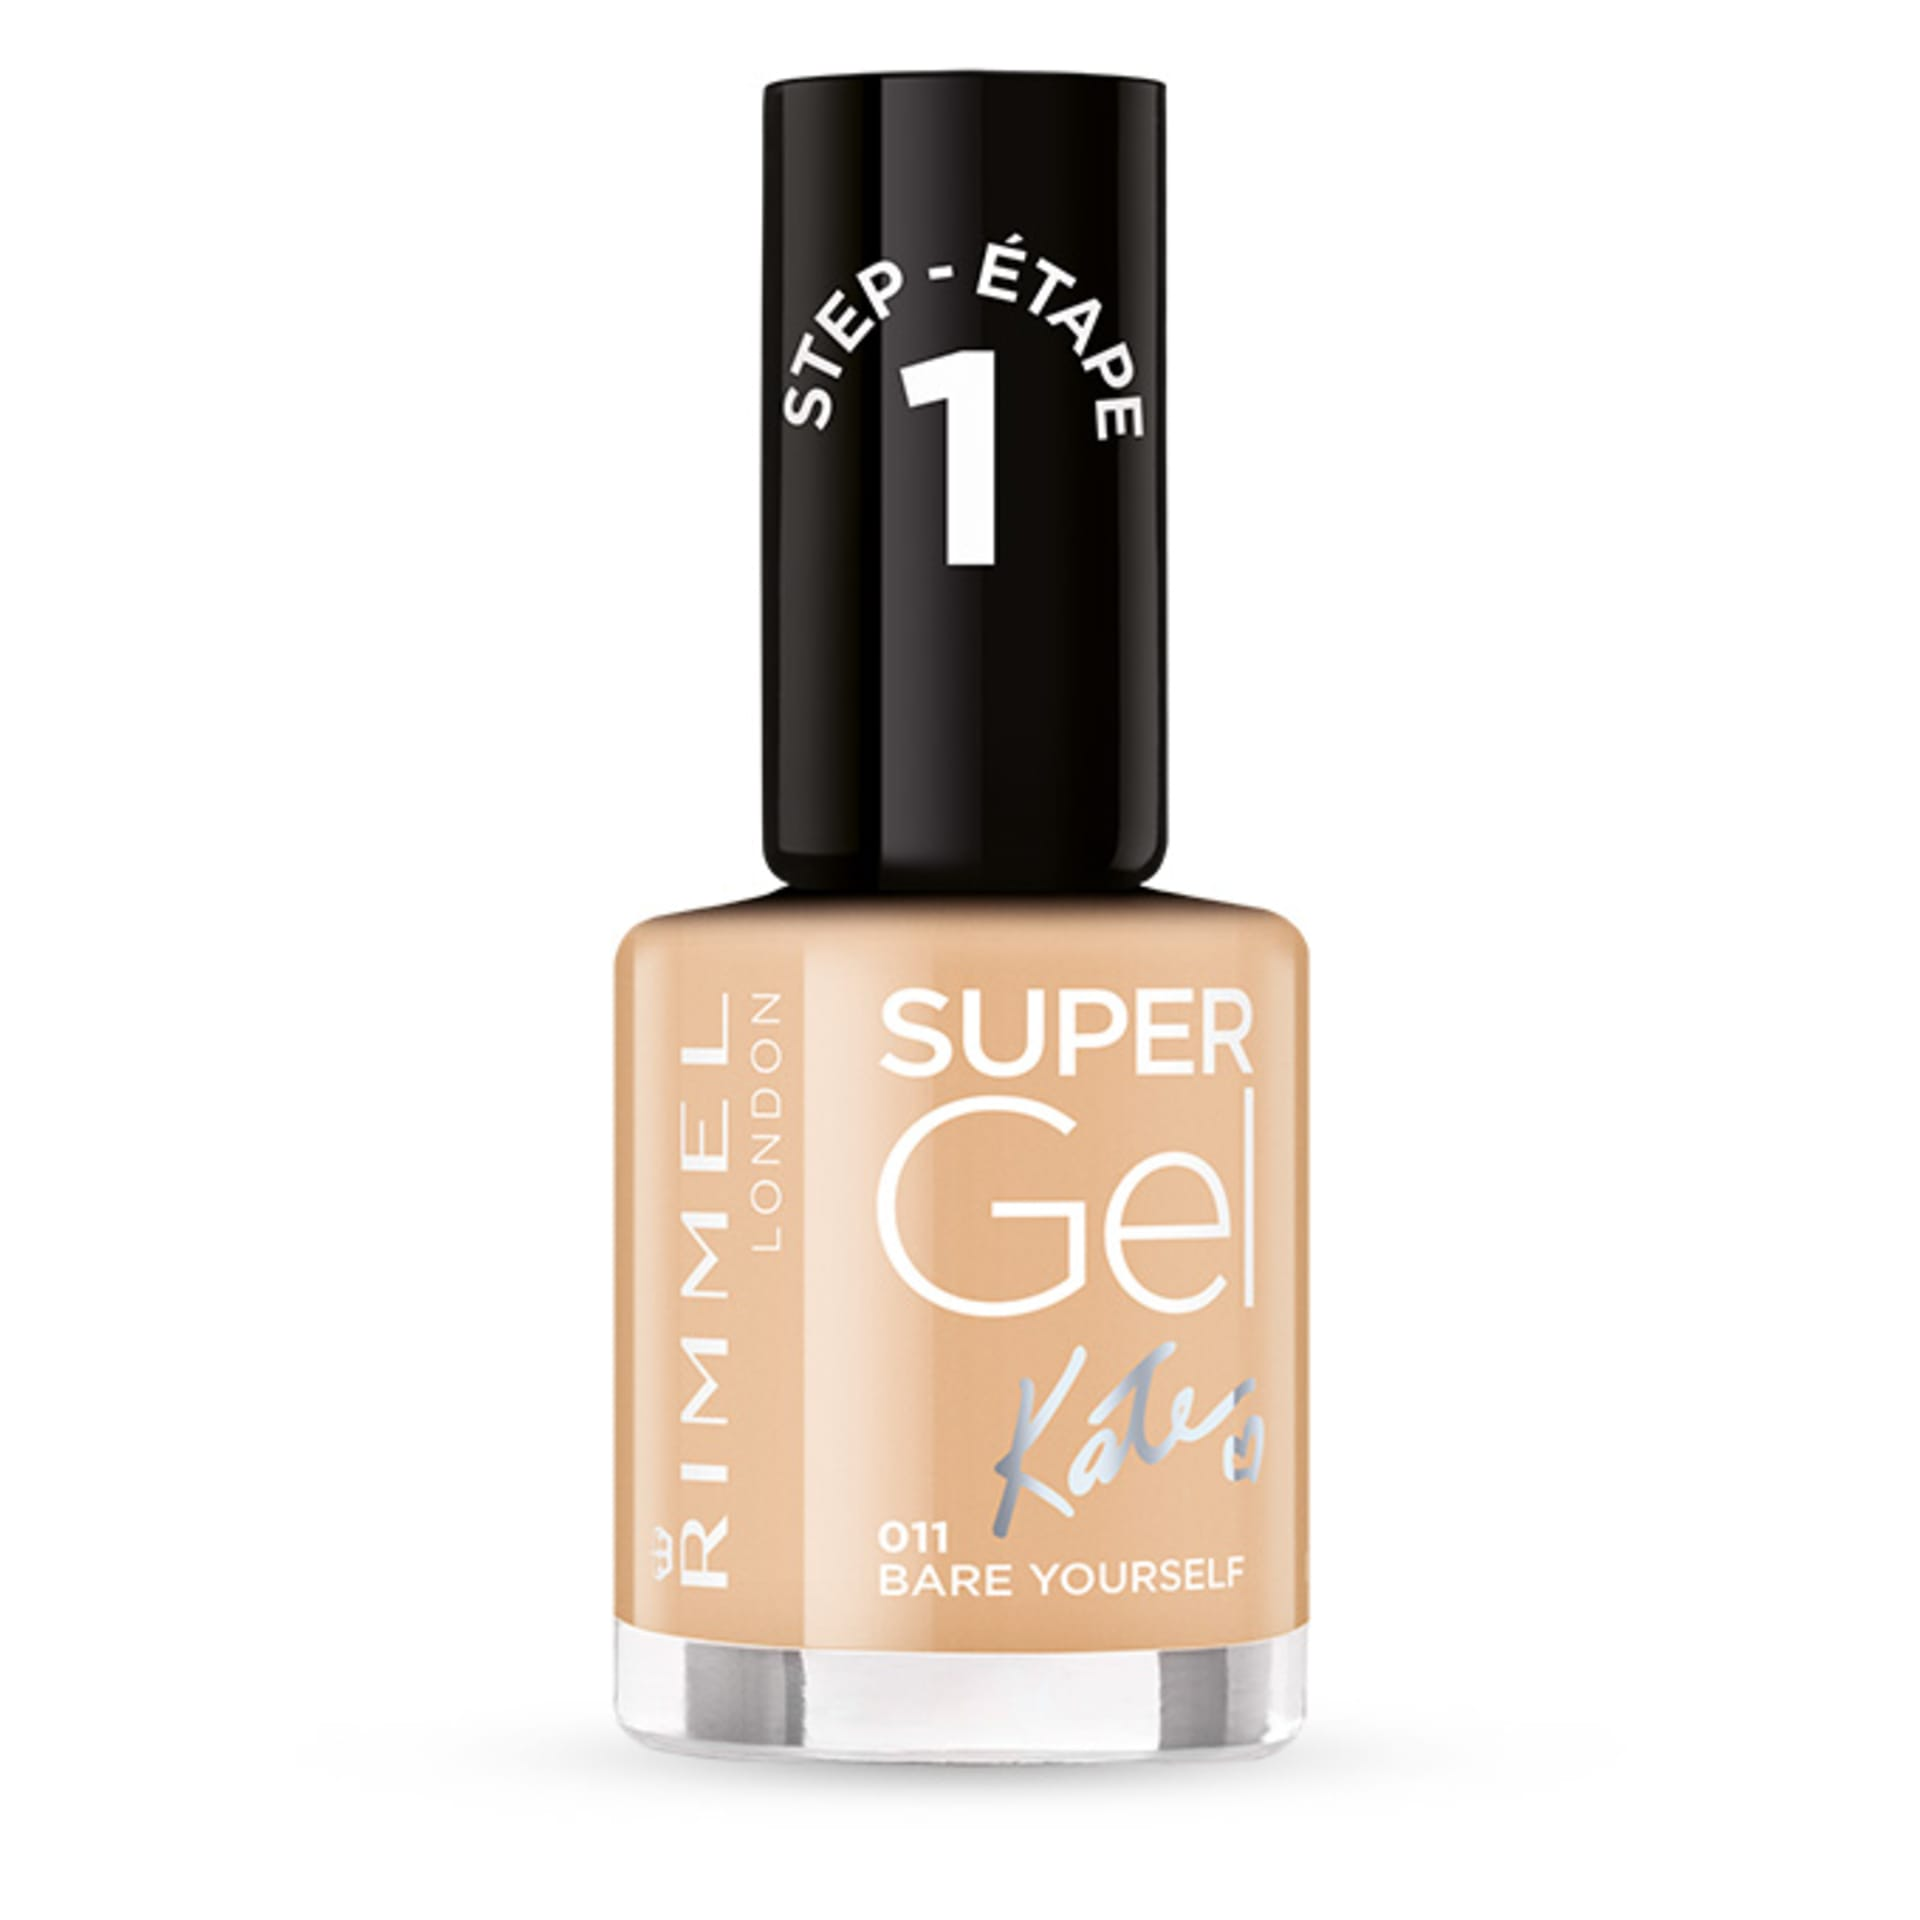 Fiive Beauty Top 5 Nude Nail Polishes Rimmel super gel nail polish - bare yourself